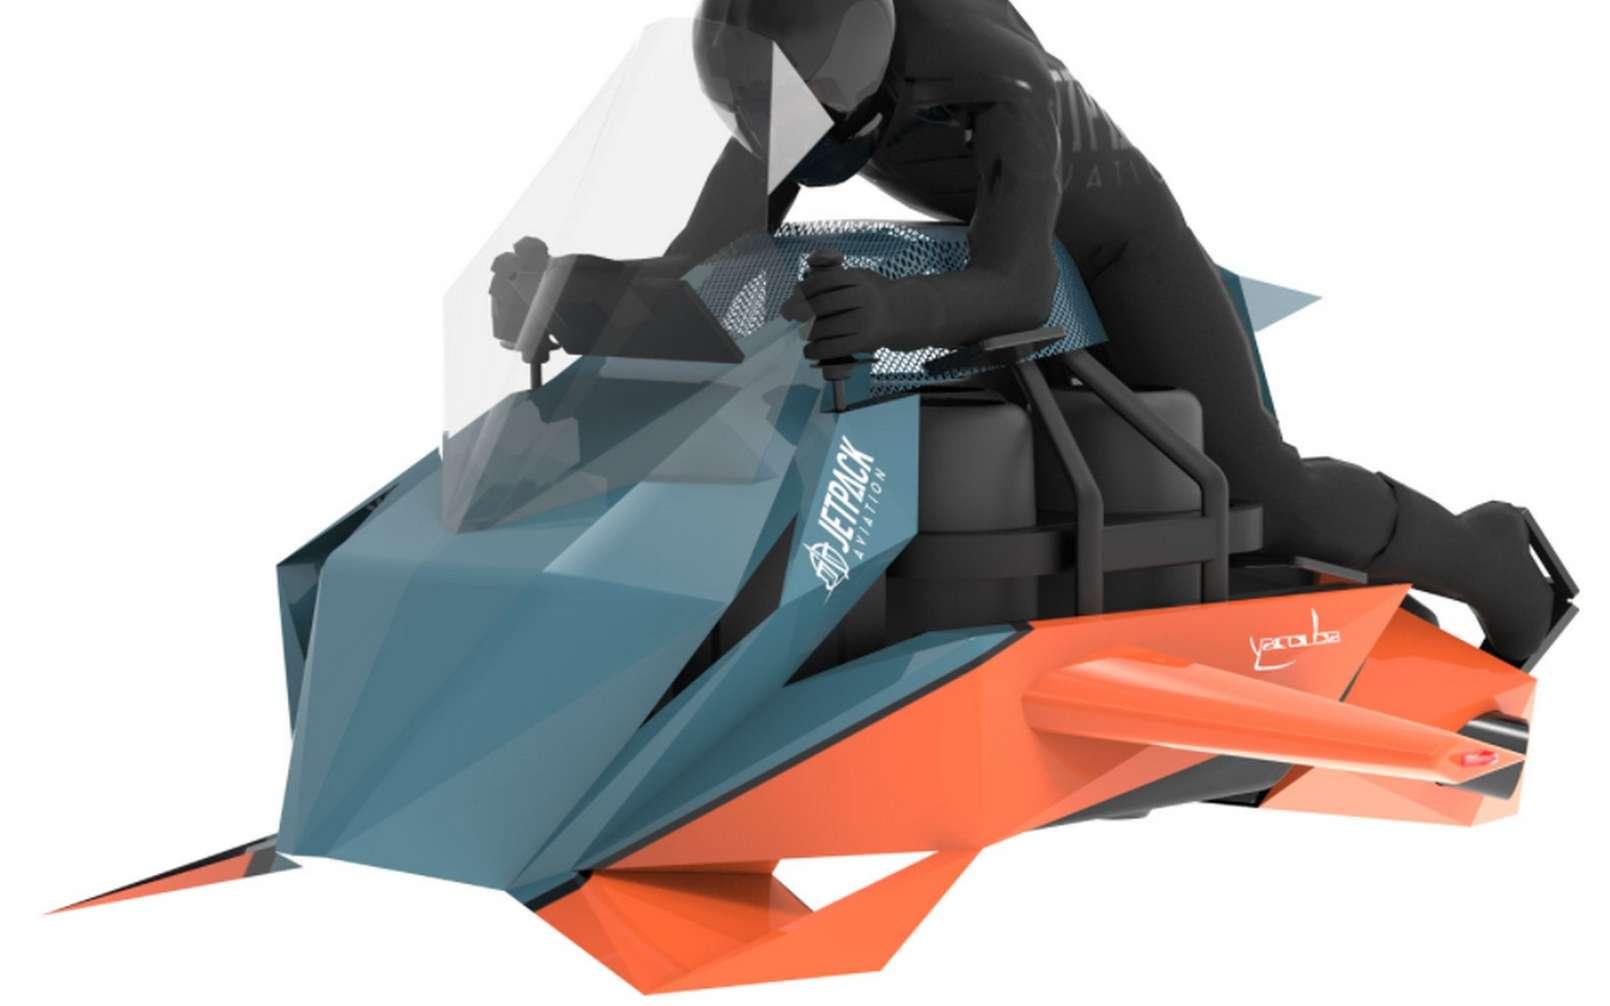 La moto volante Speeder de JetPack Aviation. © JetPack Aviation